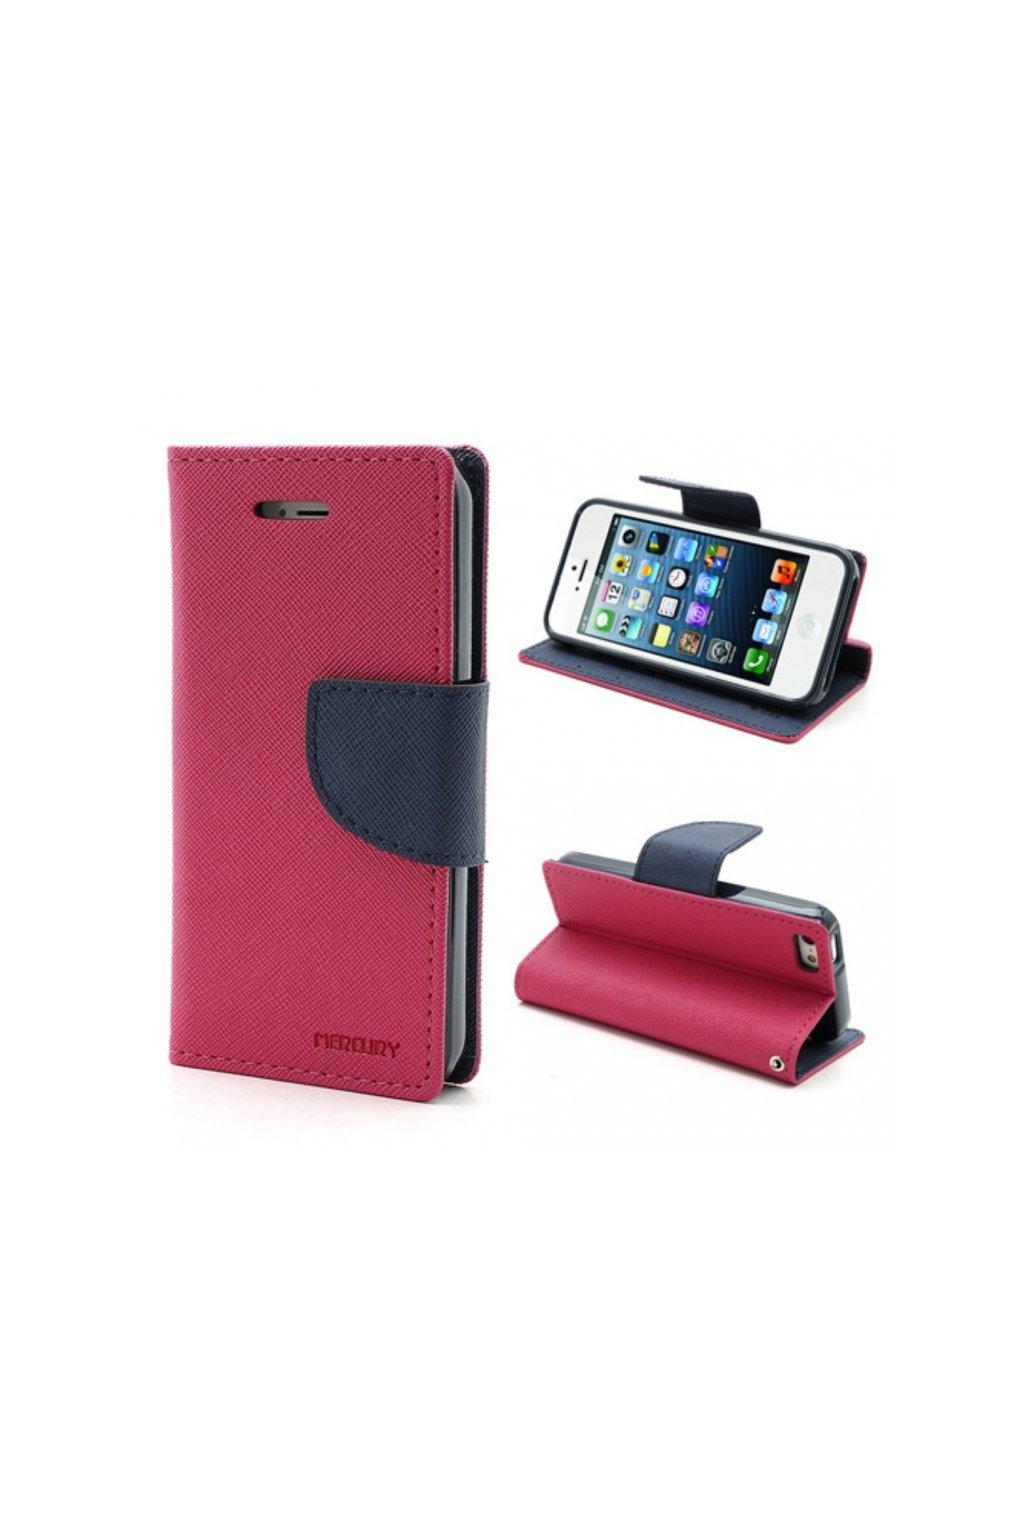 6998 pouzdro kryt pro apple iphone 5 5s se mercury fancy diary hotpink navy